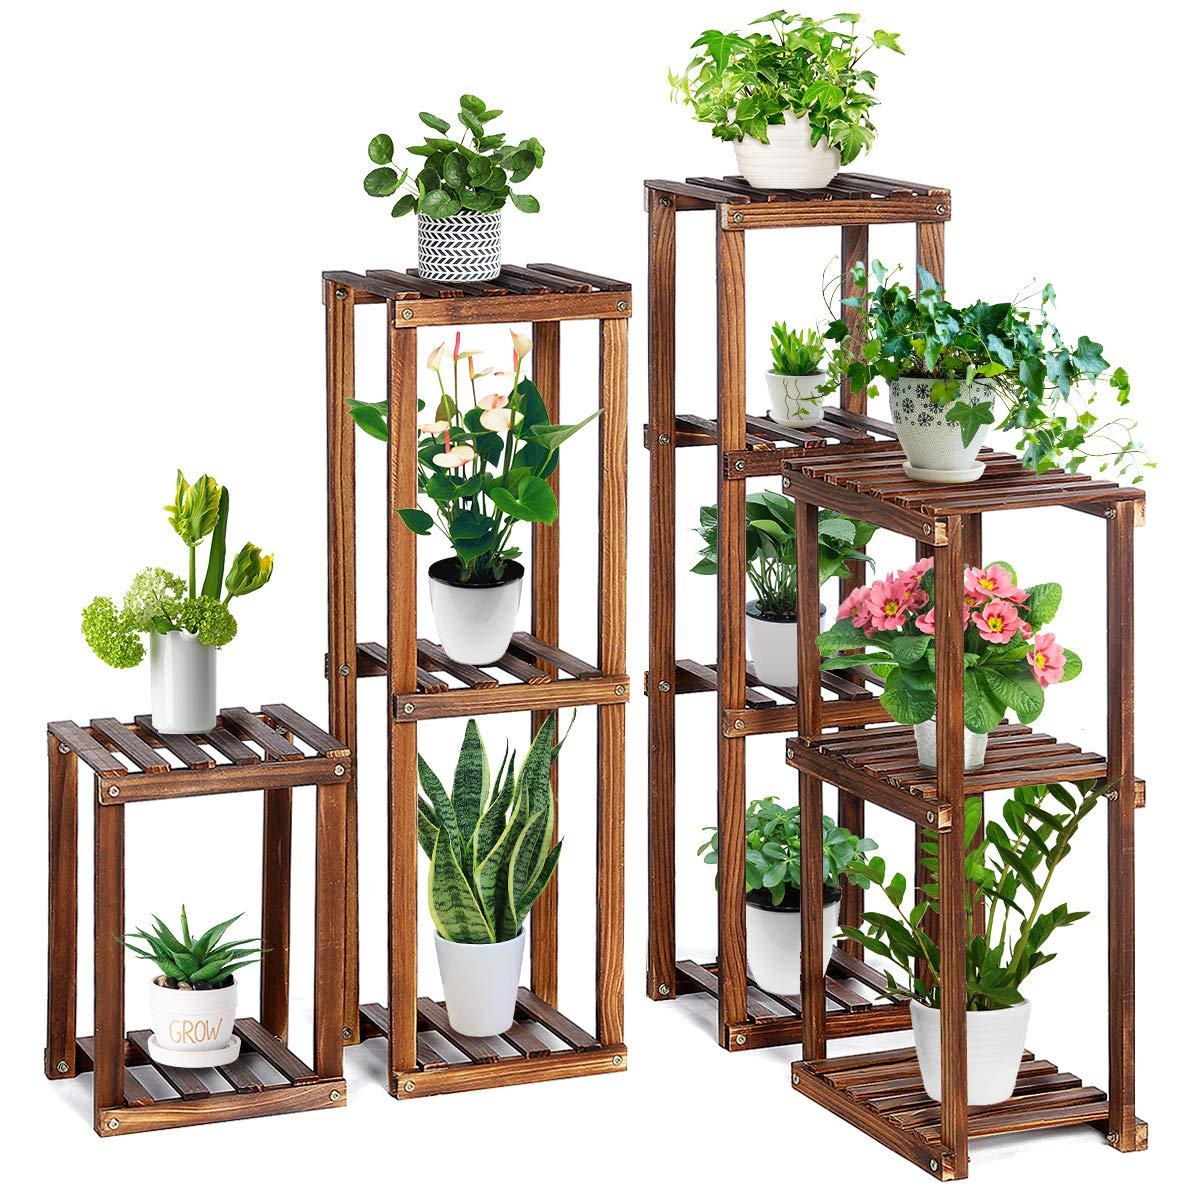 Tooca Wood Plant Stand Indoor 4 Piece Set Flexible Combination Plant Flower Pot Stands Corner Outdoor Plant Display Holder Steady Vertical Carbonized Shelves For Patio Livingroom Balcony Garden